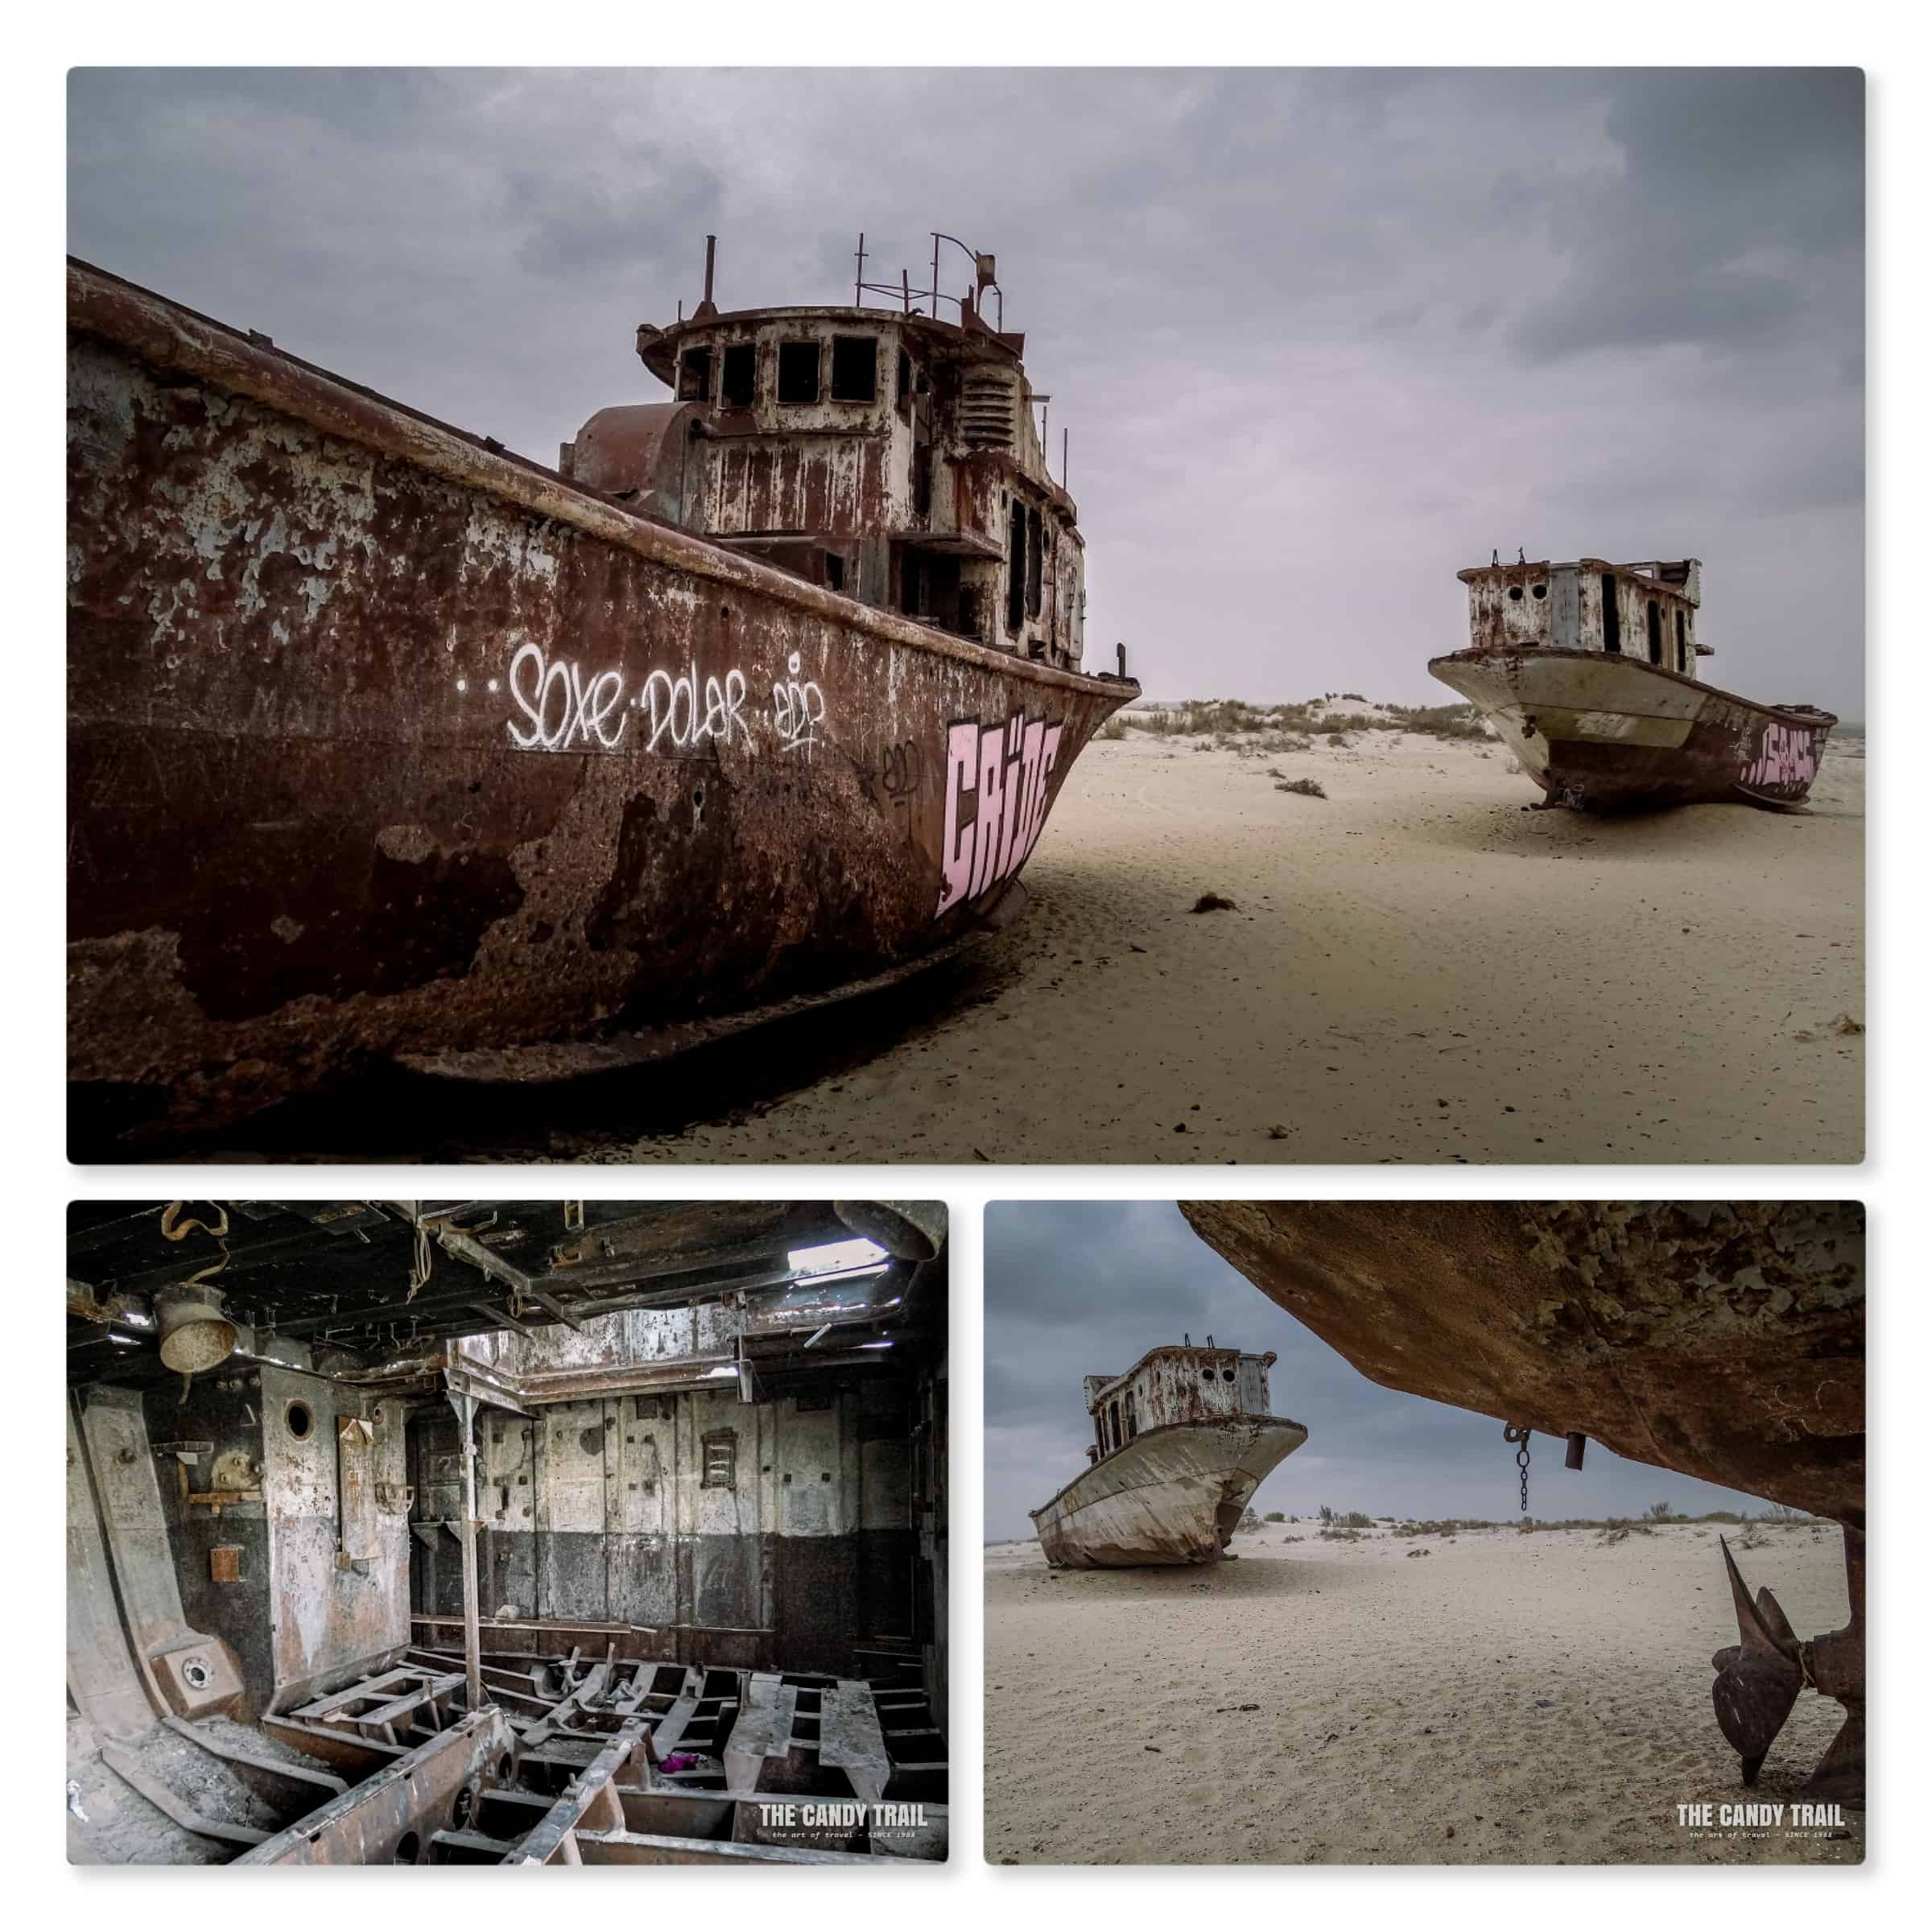 rusty ships aral sea images at moynaq in uzbekistan